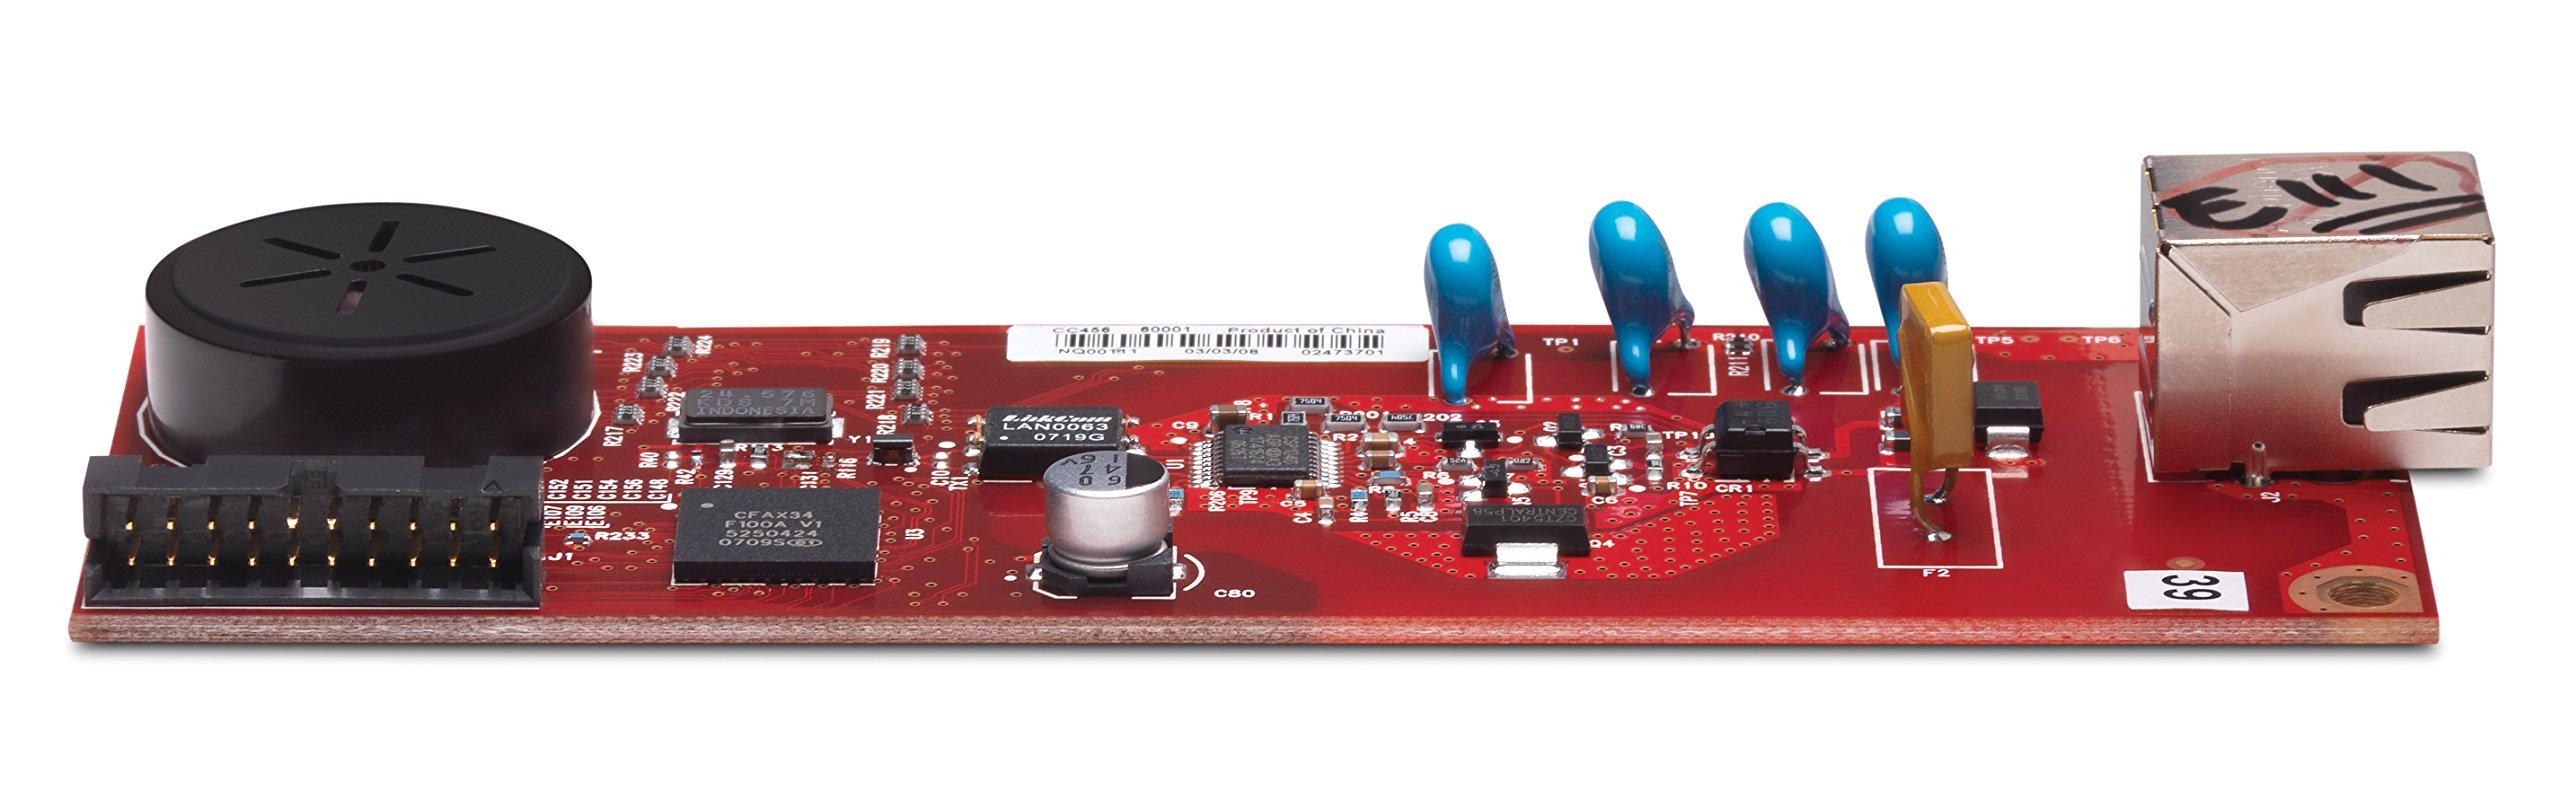 HP LaserJet MFP Analog Fax Accessory 600 B5L53A by HP